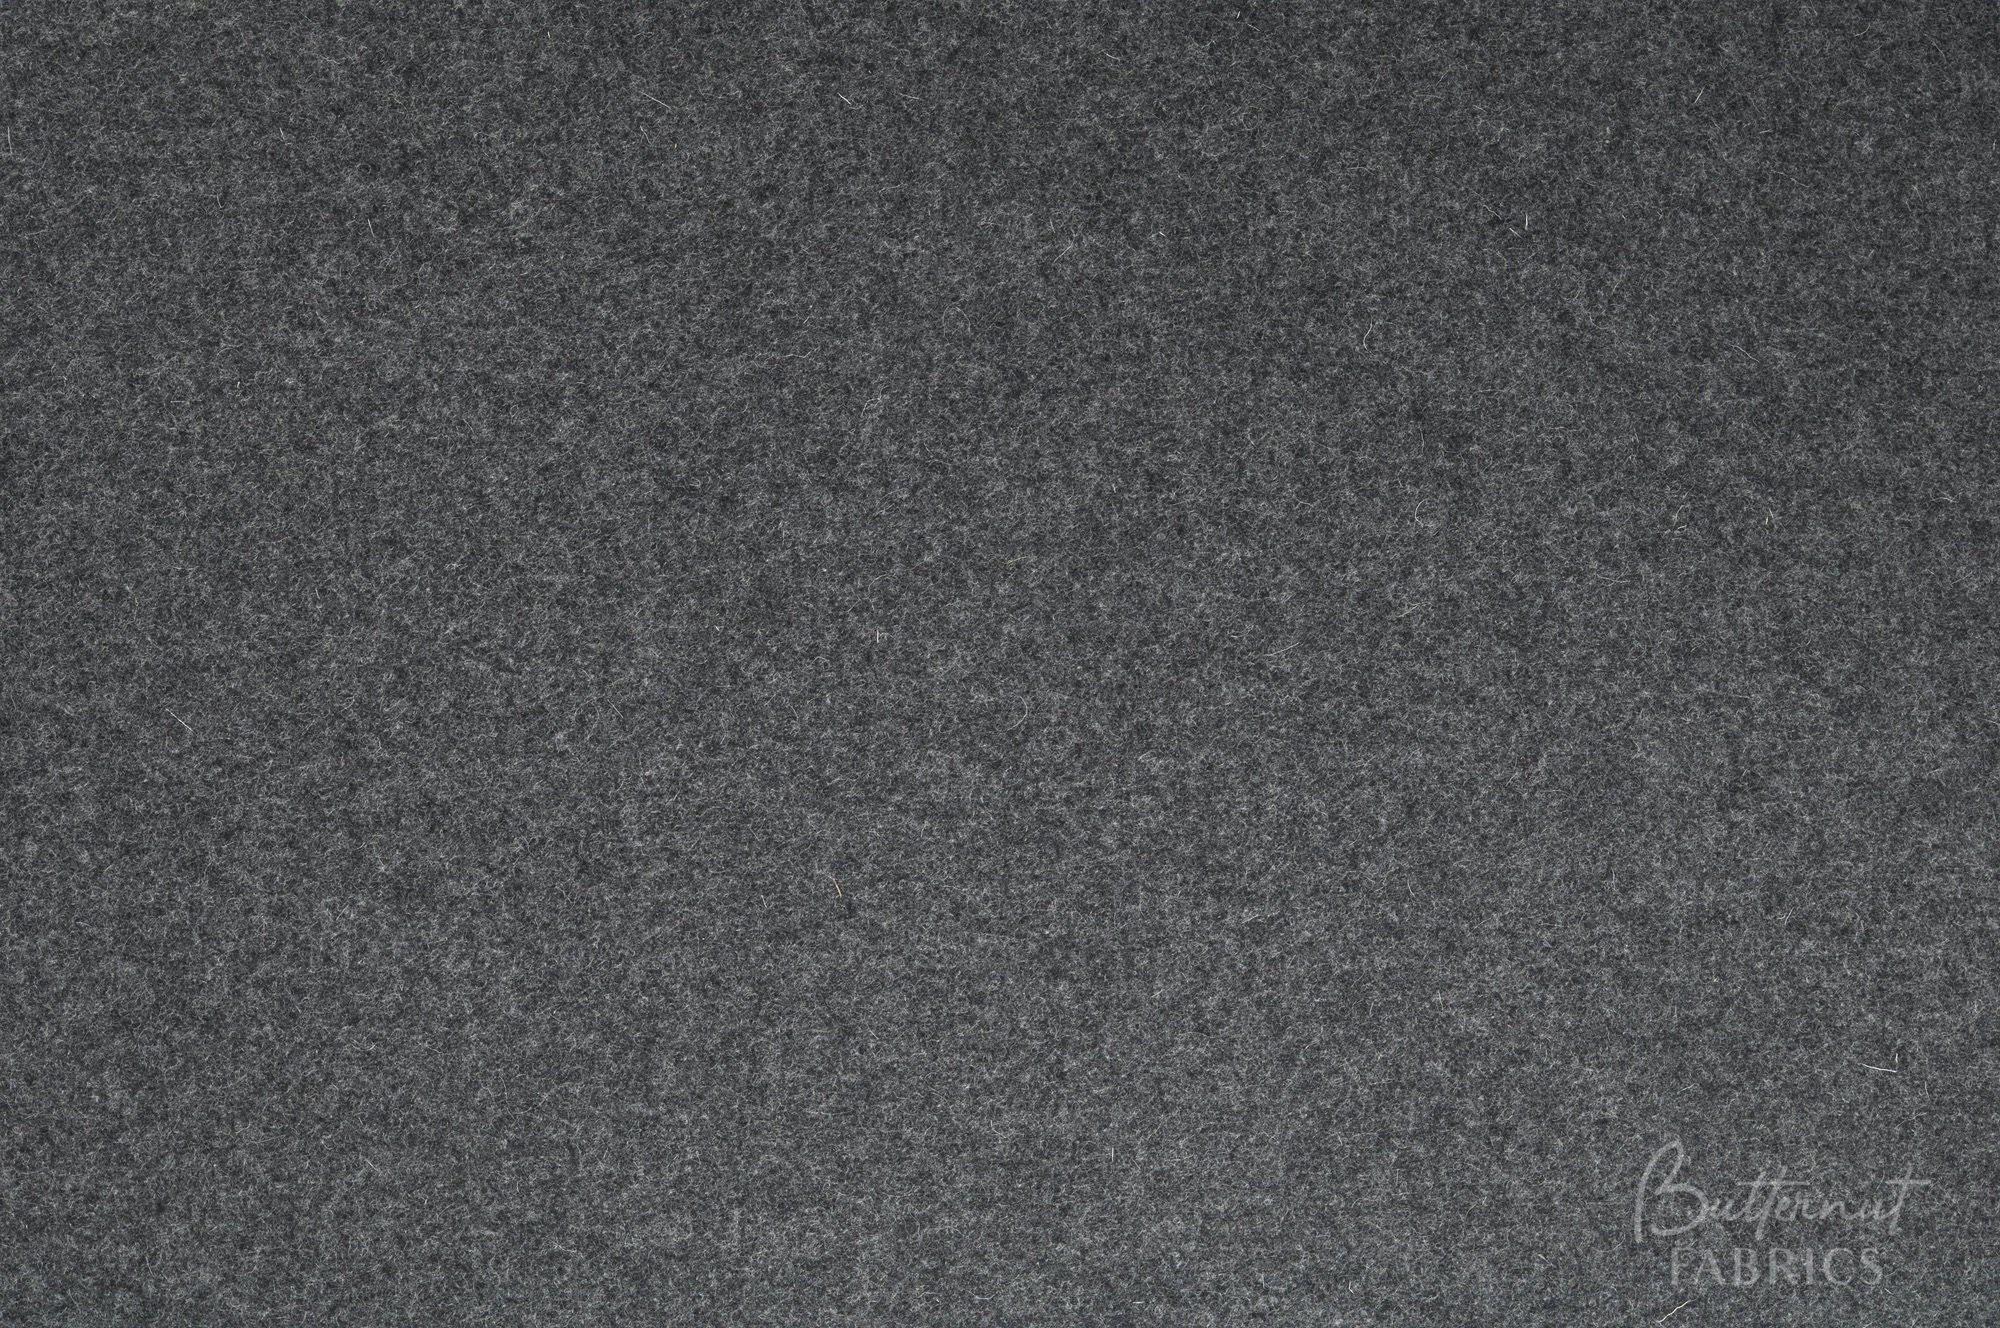 Moon Wool Spectrum Electric U7979 A01 1.2m | Butternut Fabrics